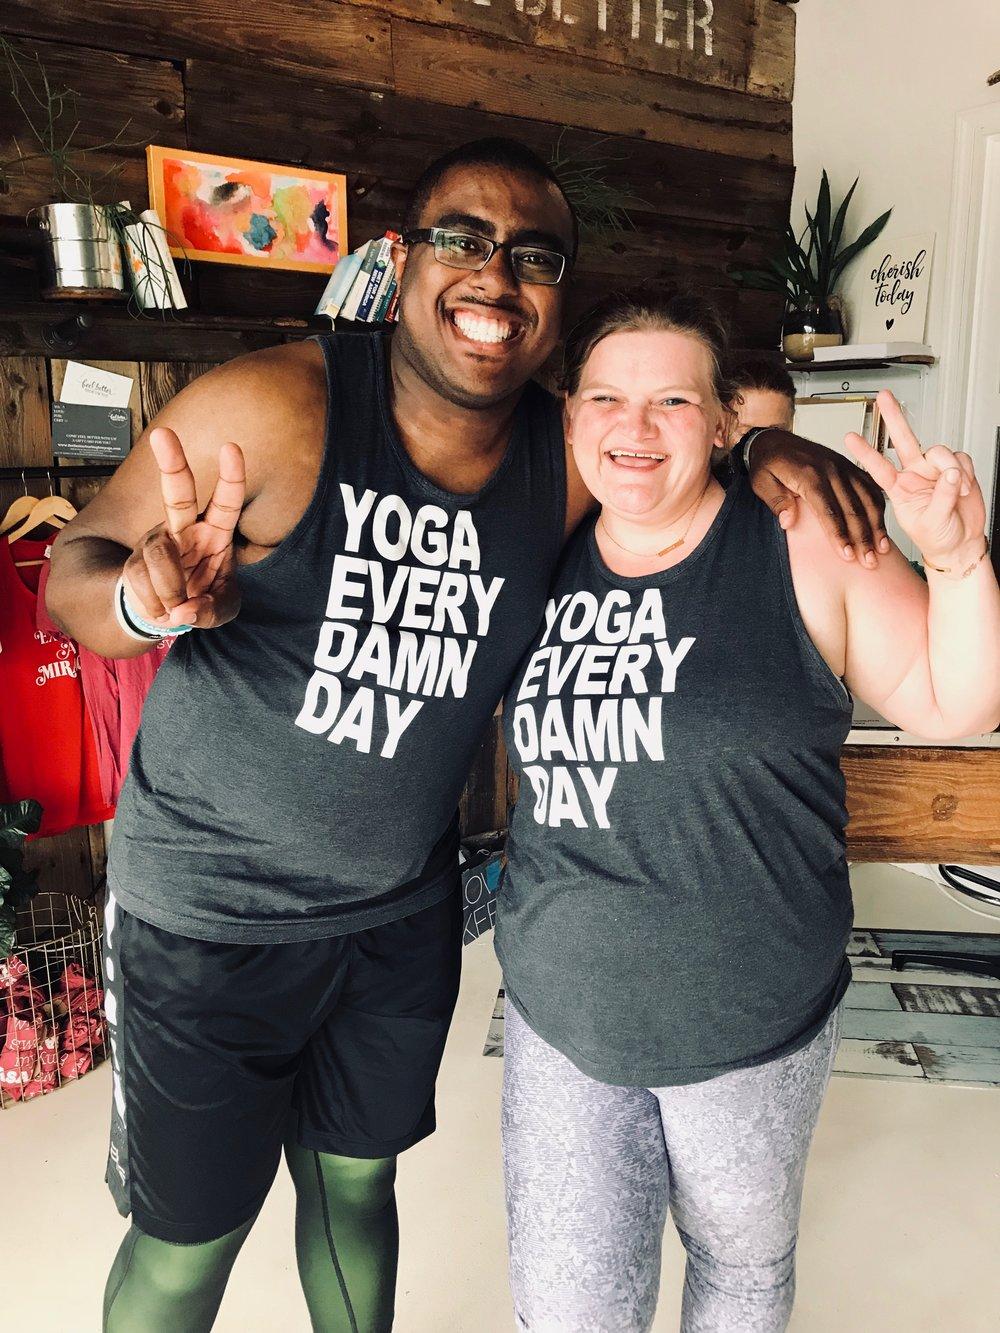 Heated Yoga Studio in North Carolina